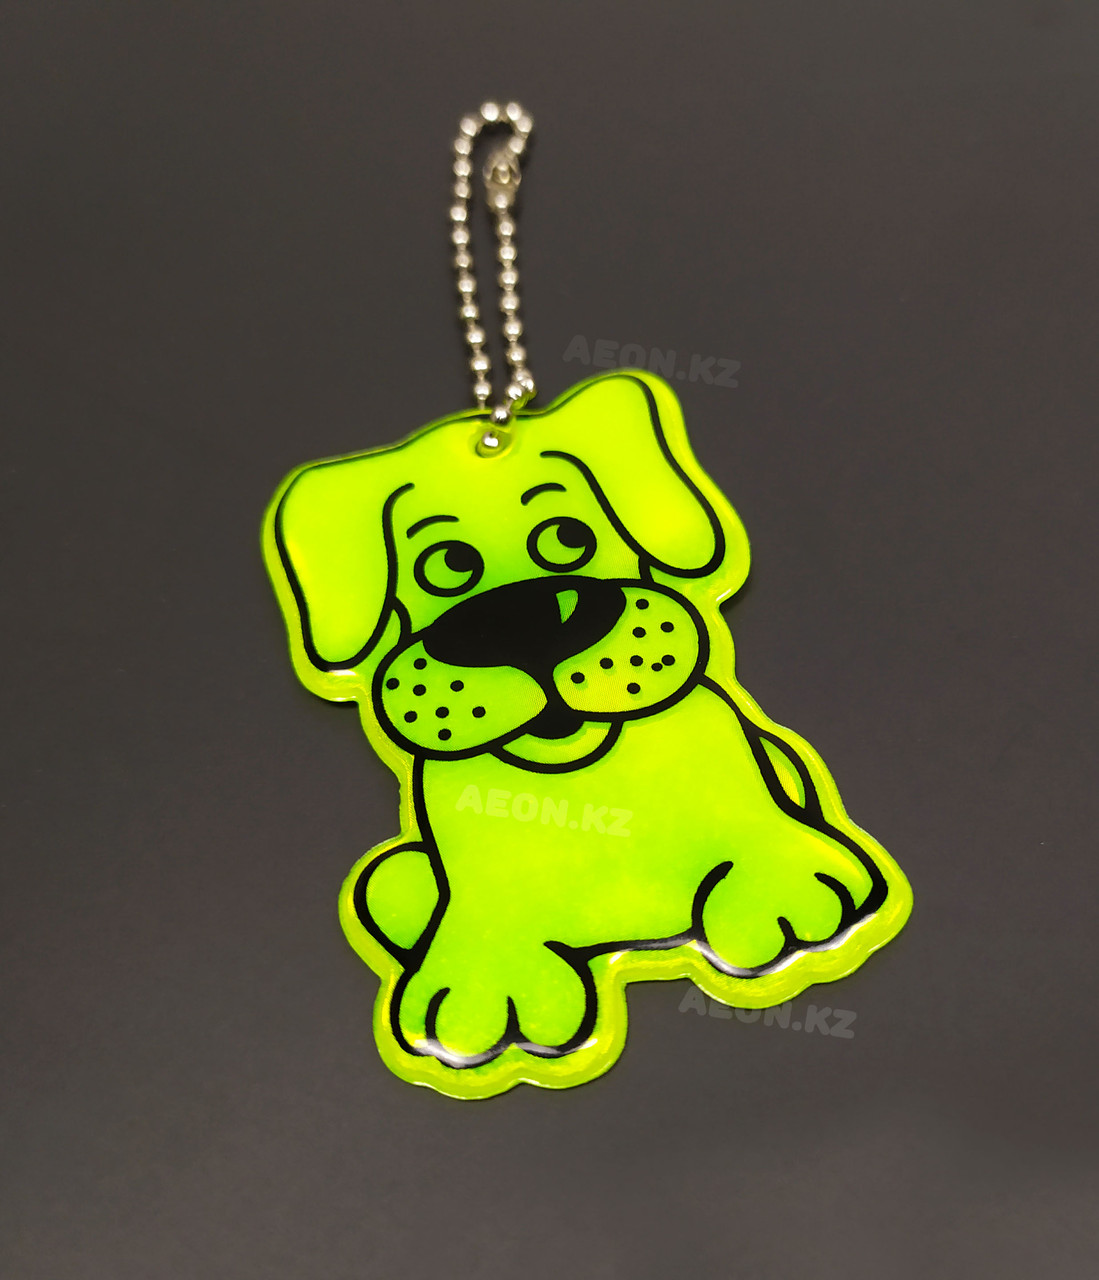 Брелок светоотражающий (Пёс) - фото 1